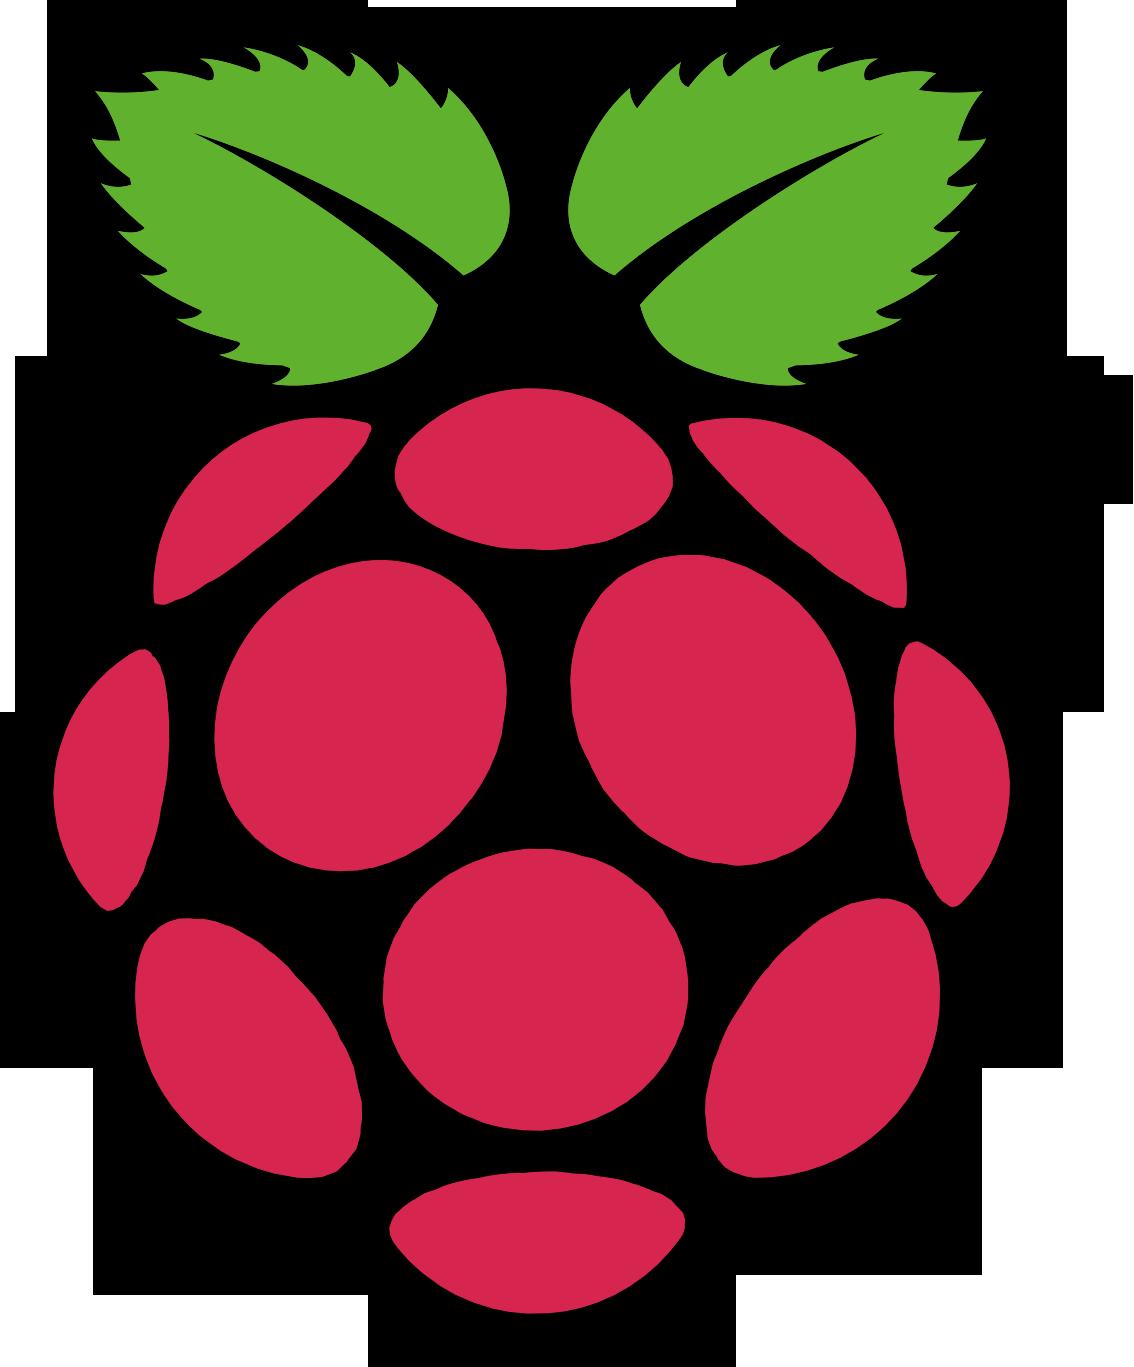 Raspberry Pi PNG - 75721